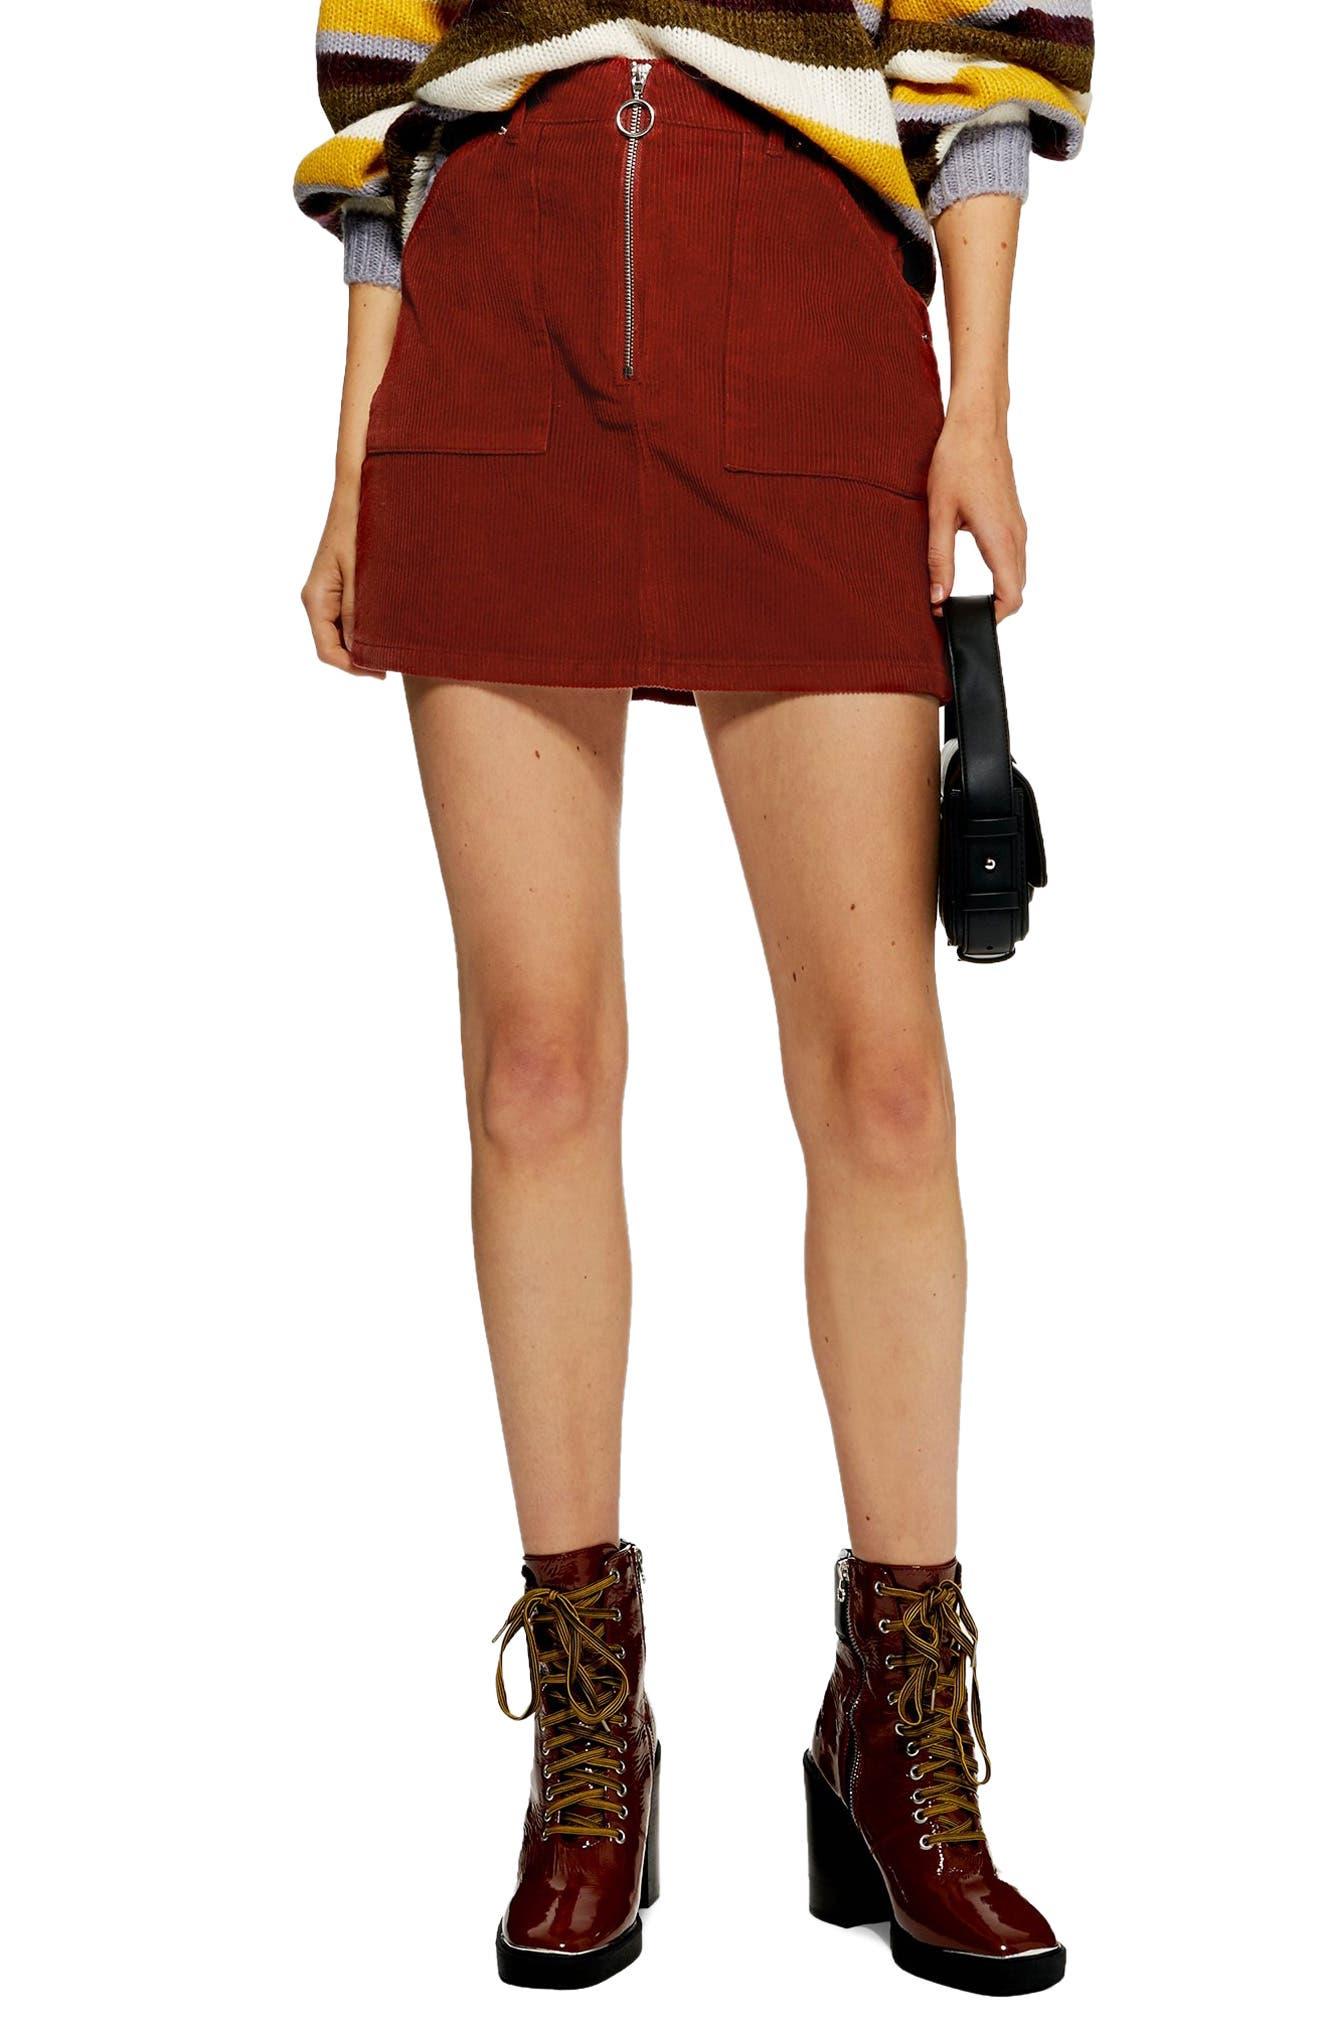 Topshop Front Zip Corduroy Miniskirt, US (fits like 0) - Metallic